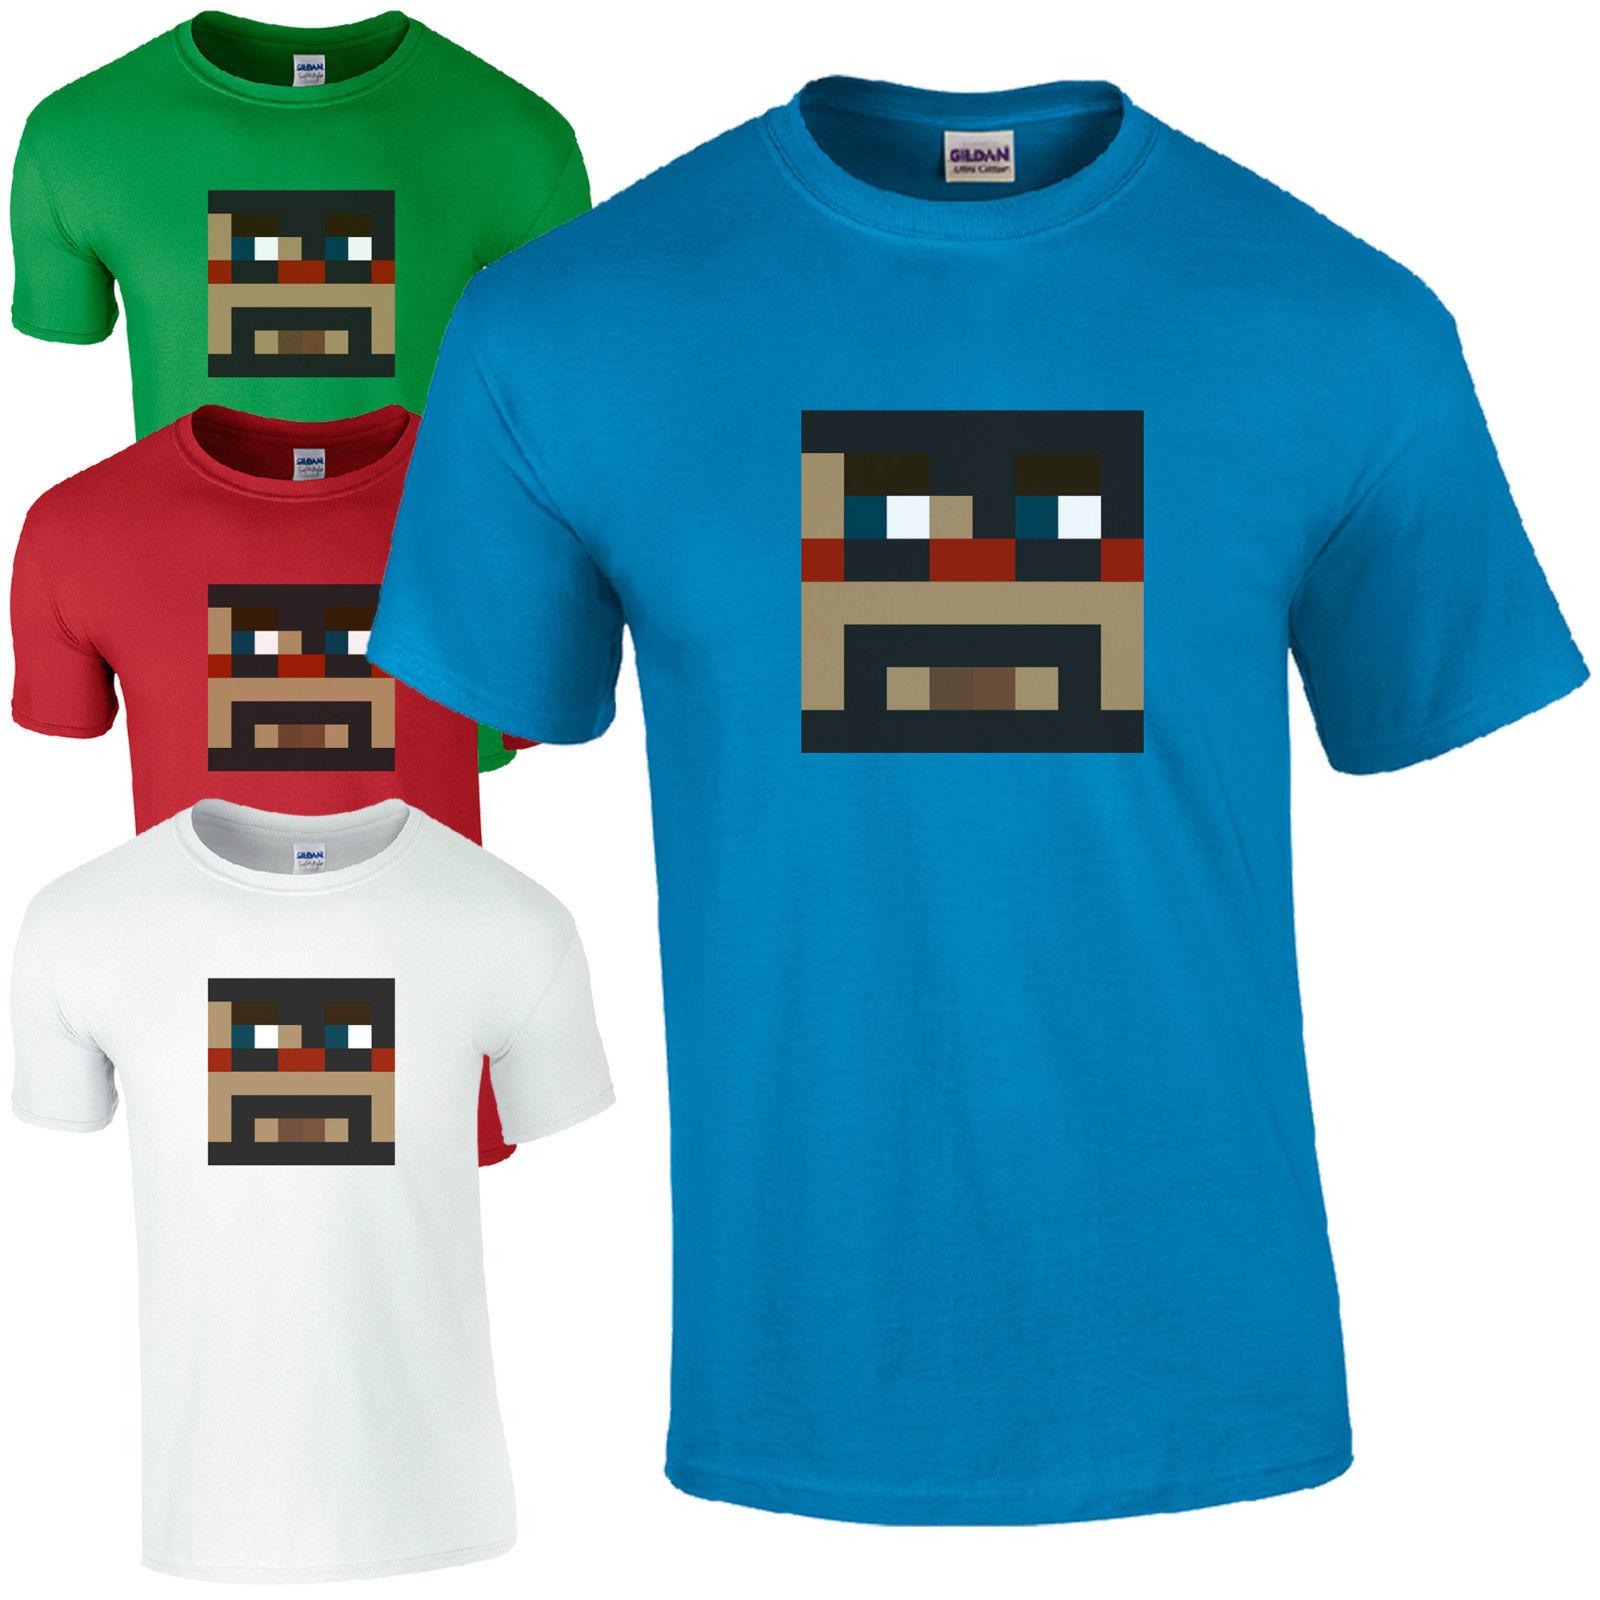 T shirt design youtube - T Shirts Fashion 2016 Crew Neck Men Short Sleeve Captainsparklez Fun Cool Cs Youtube Video